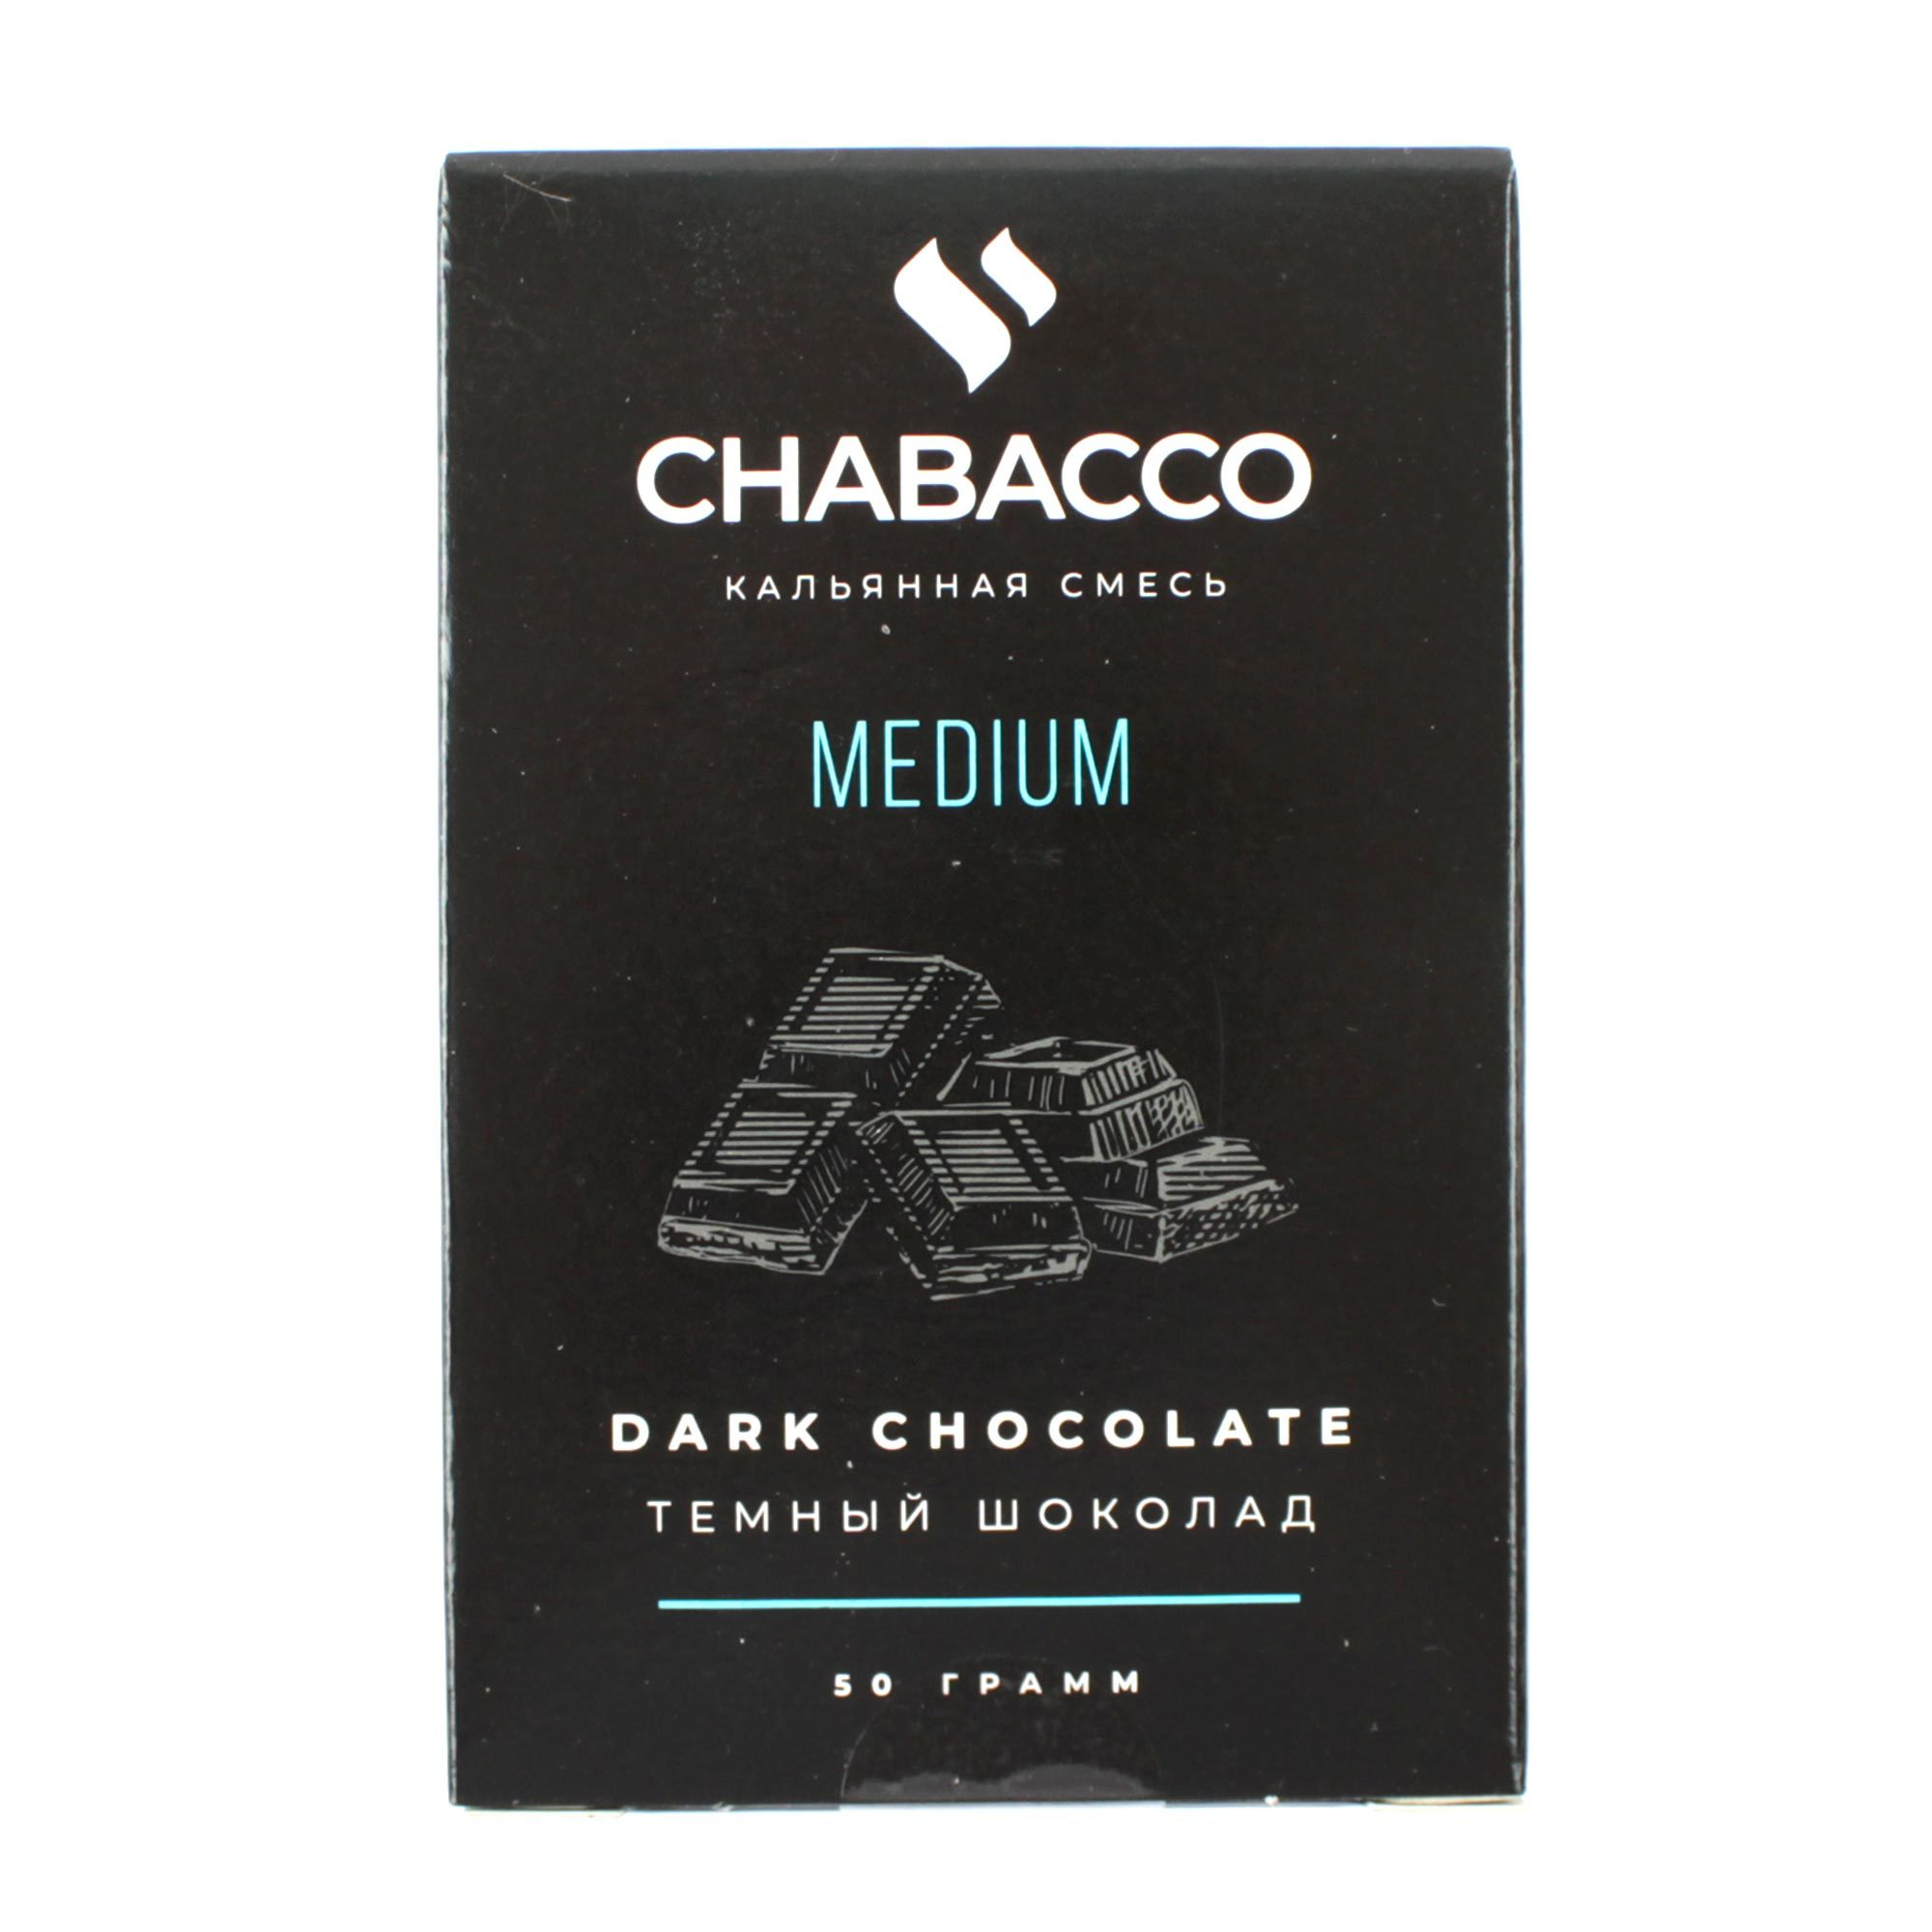 Кальянная смесь Chabacco Medium 50 гр Dark Chocolate